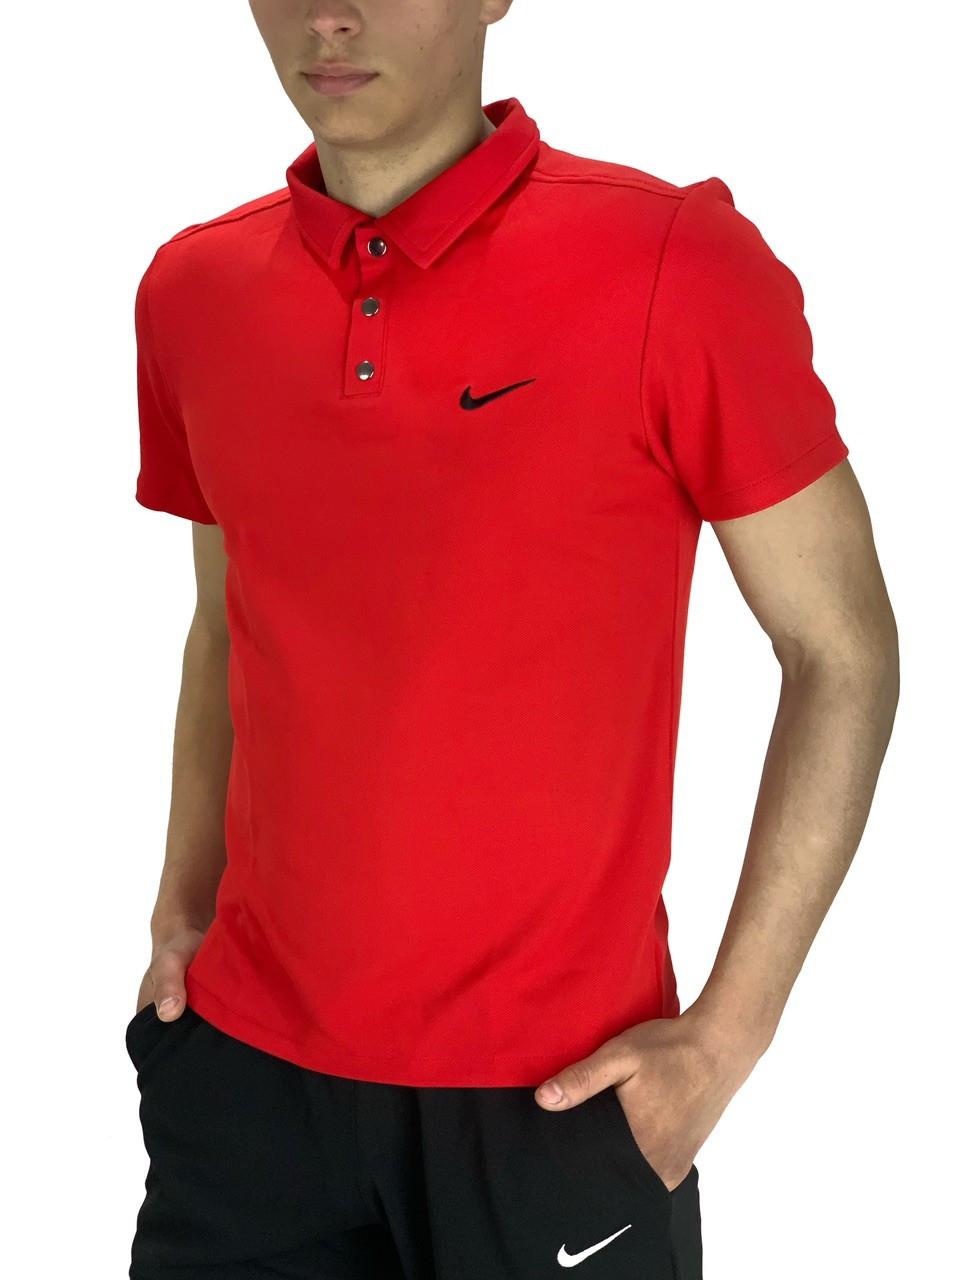 Мужская красная повседневная футболка поло Nike